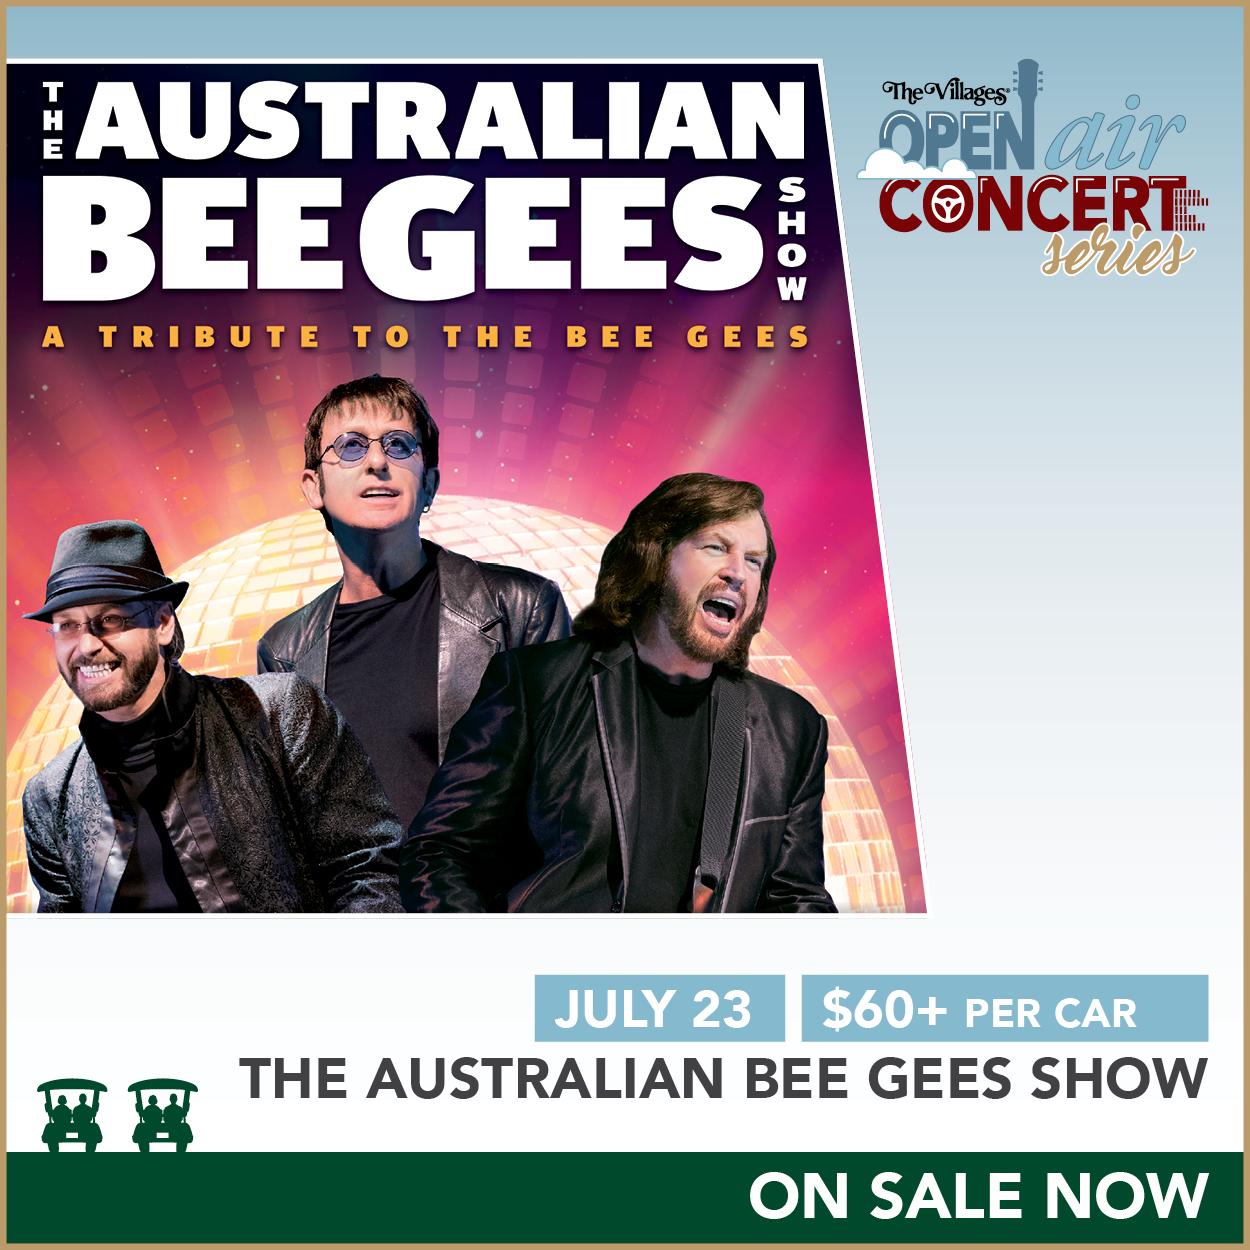 Open Air Concert Series – The Australian Bee Gees